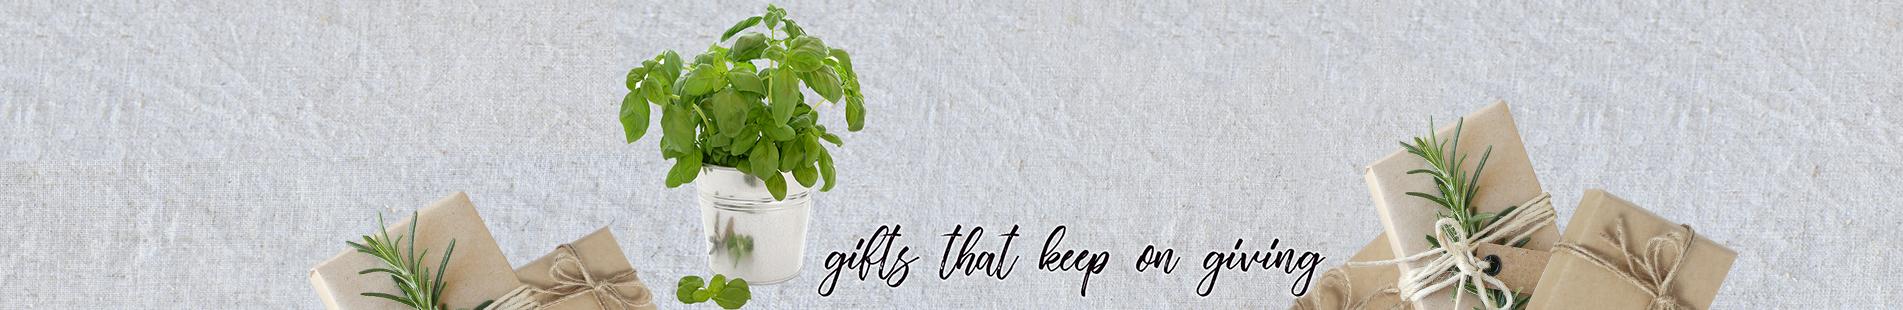 Grow herbs on your windowsill